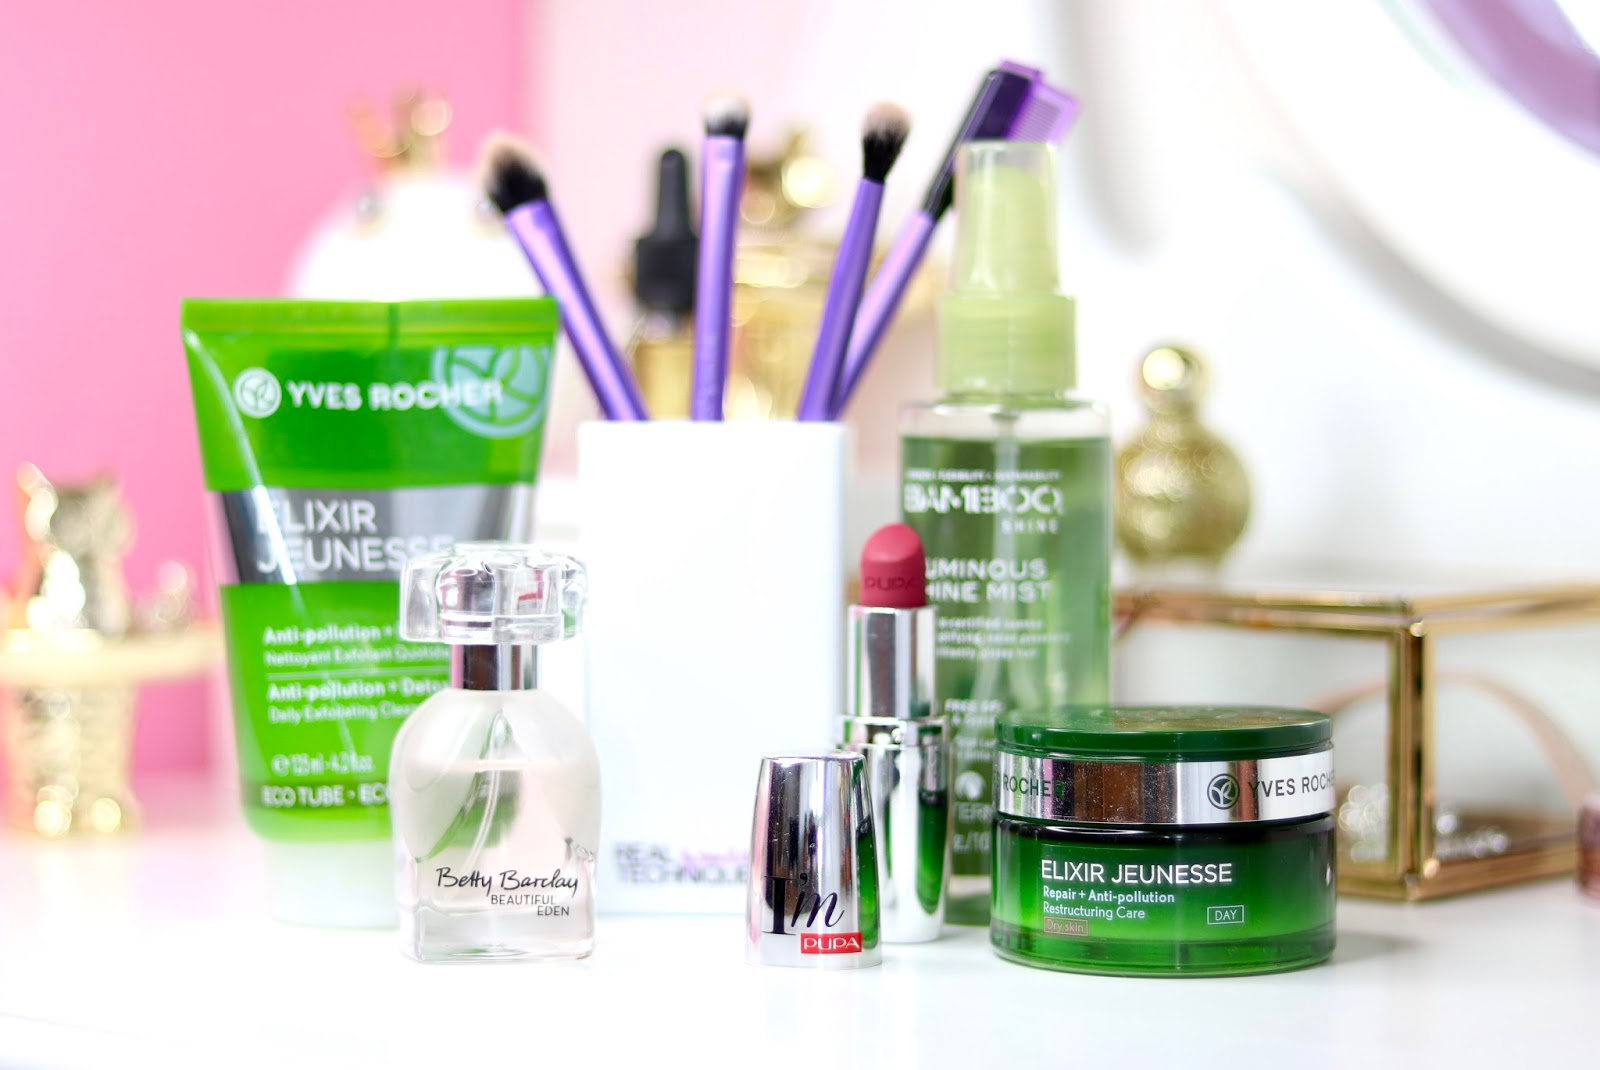 slovak beauty blogger, testujeme kozmetiku